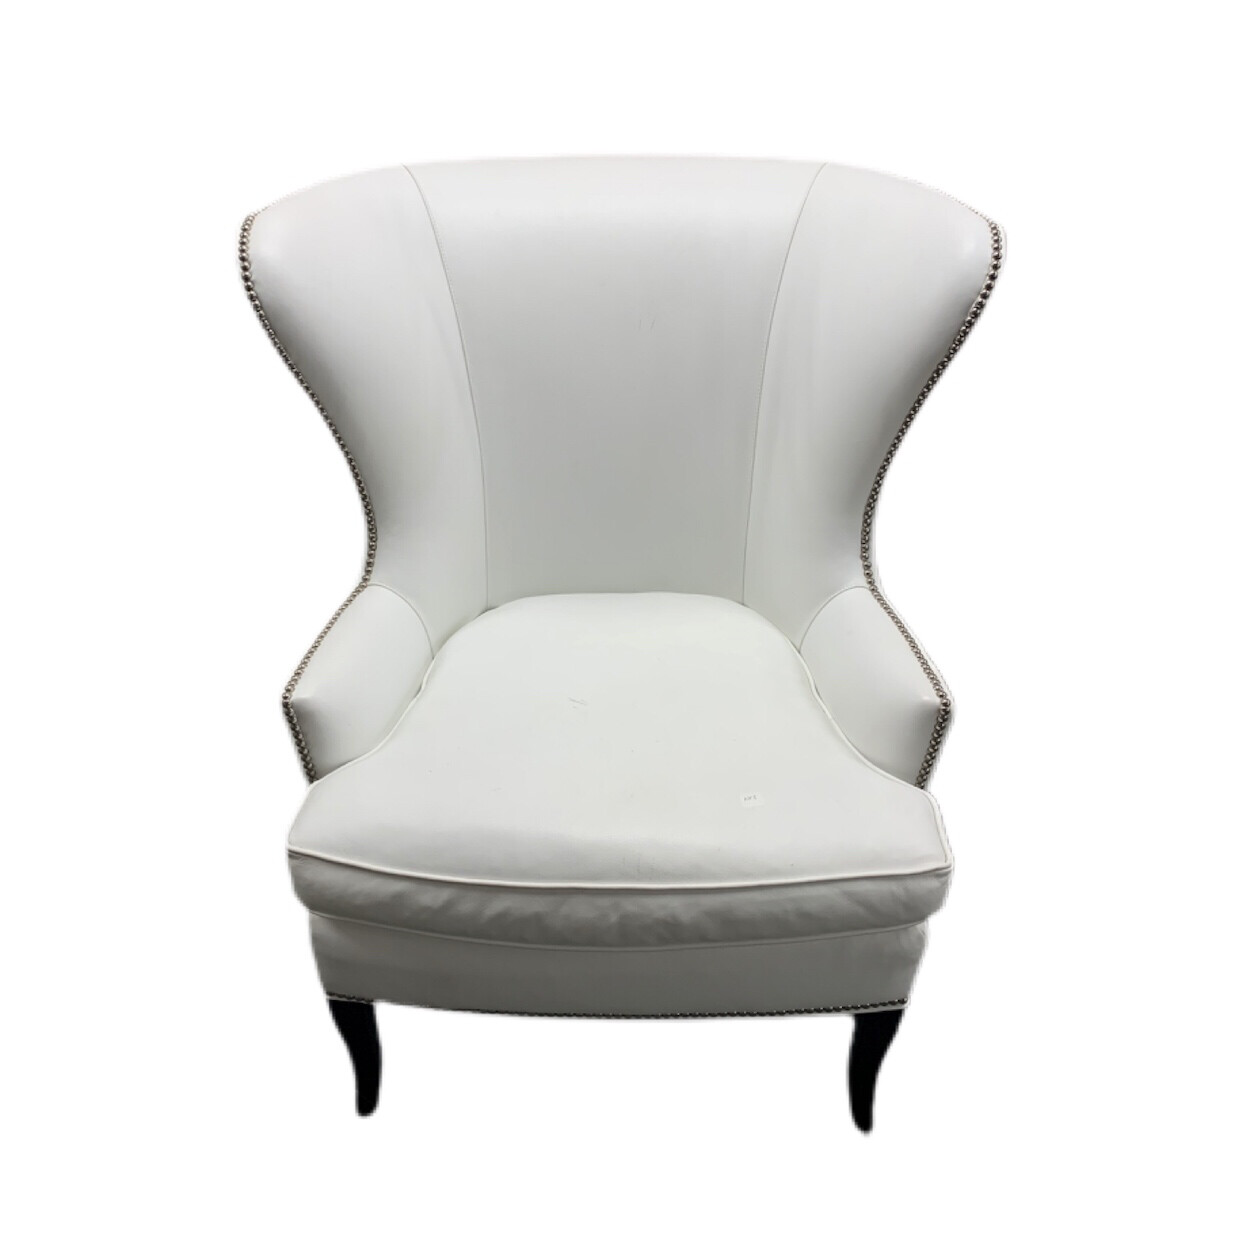 William Sonoma Chelsea Wing Chair 